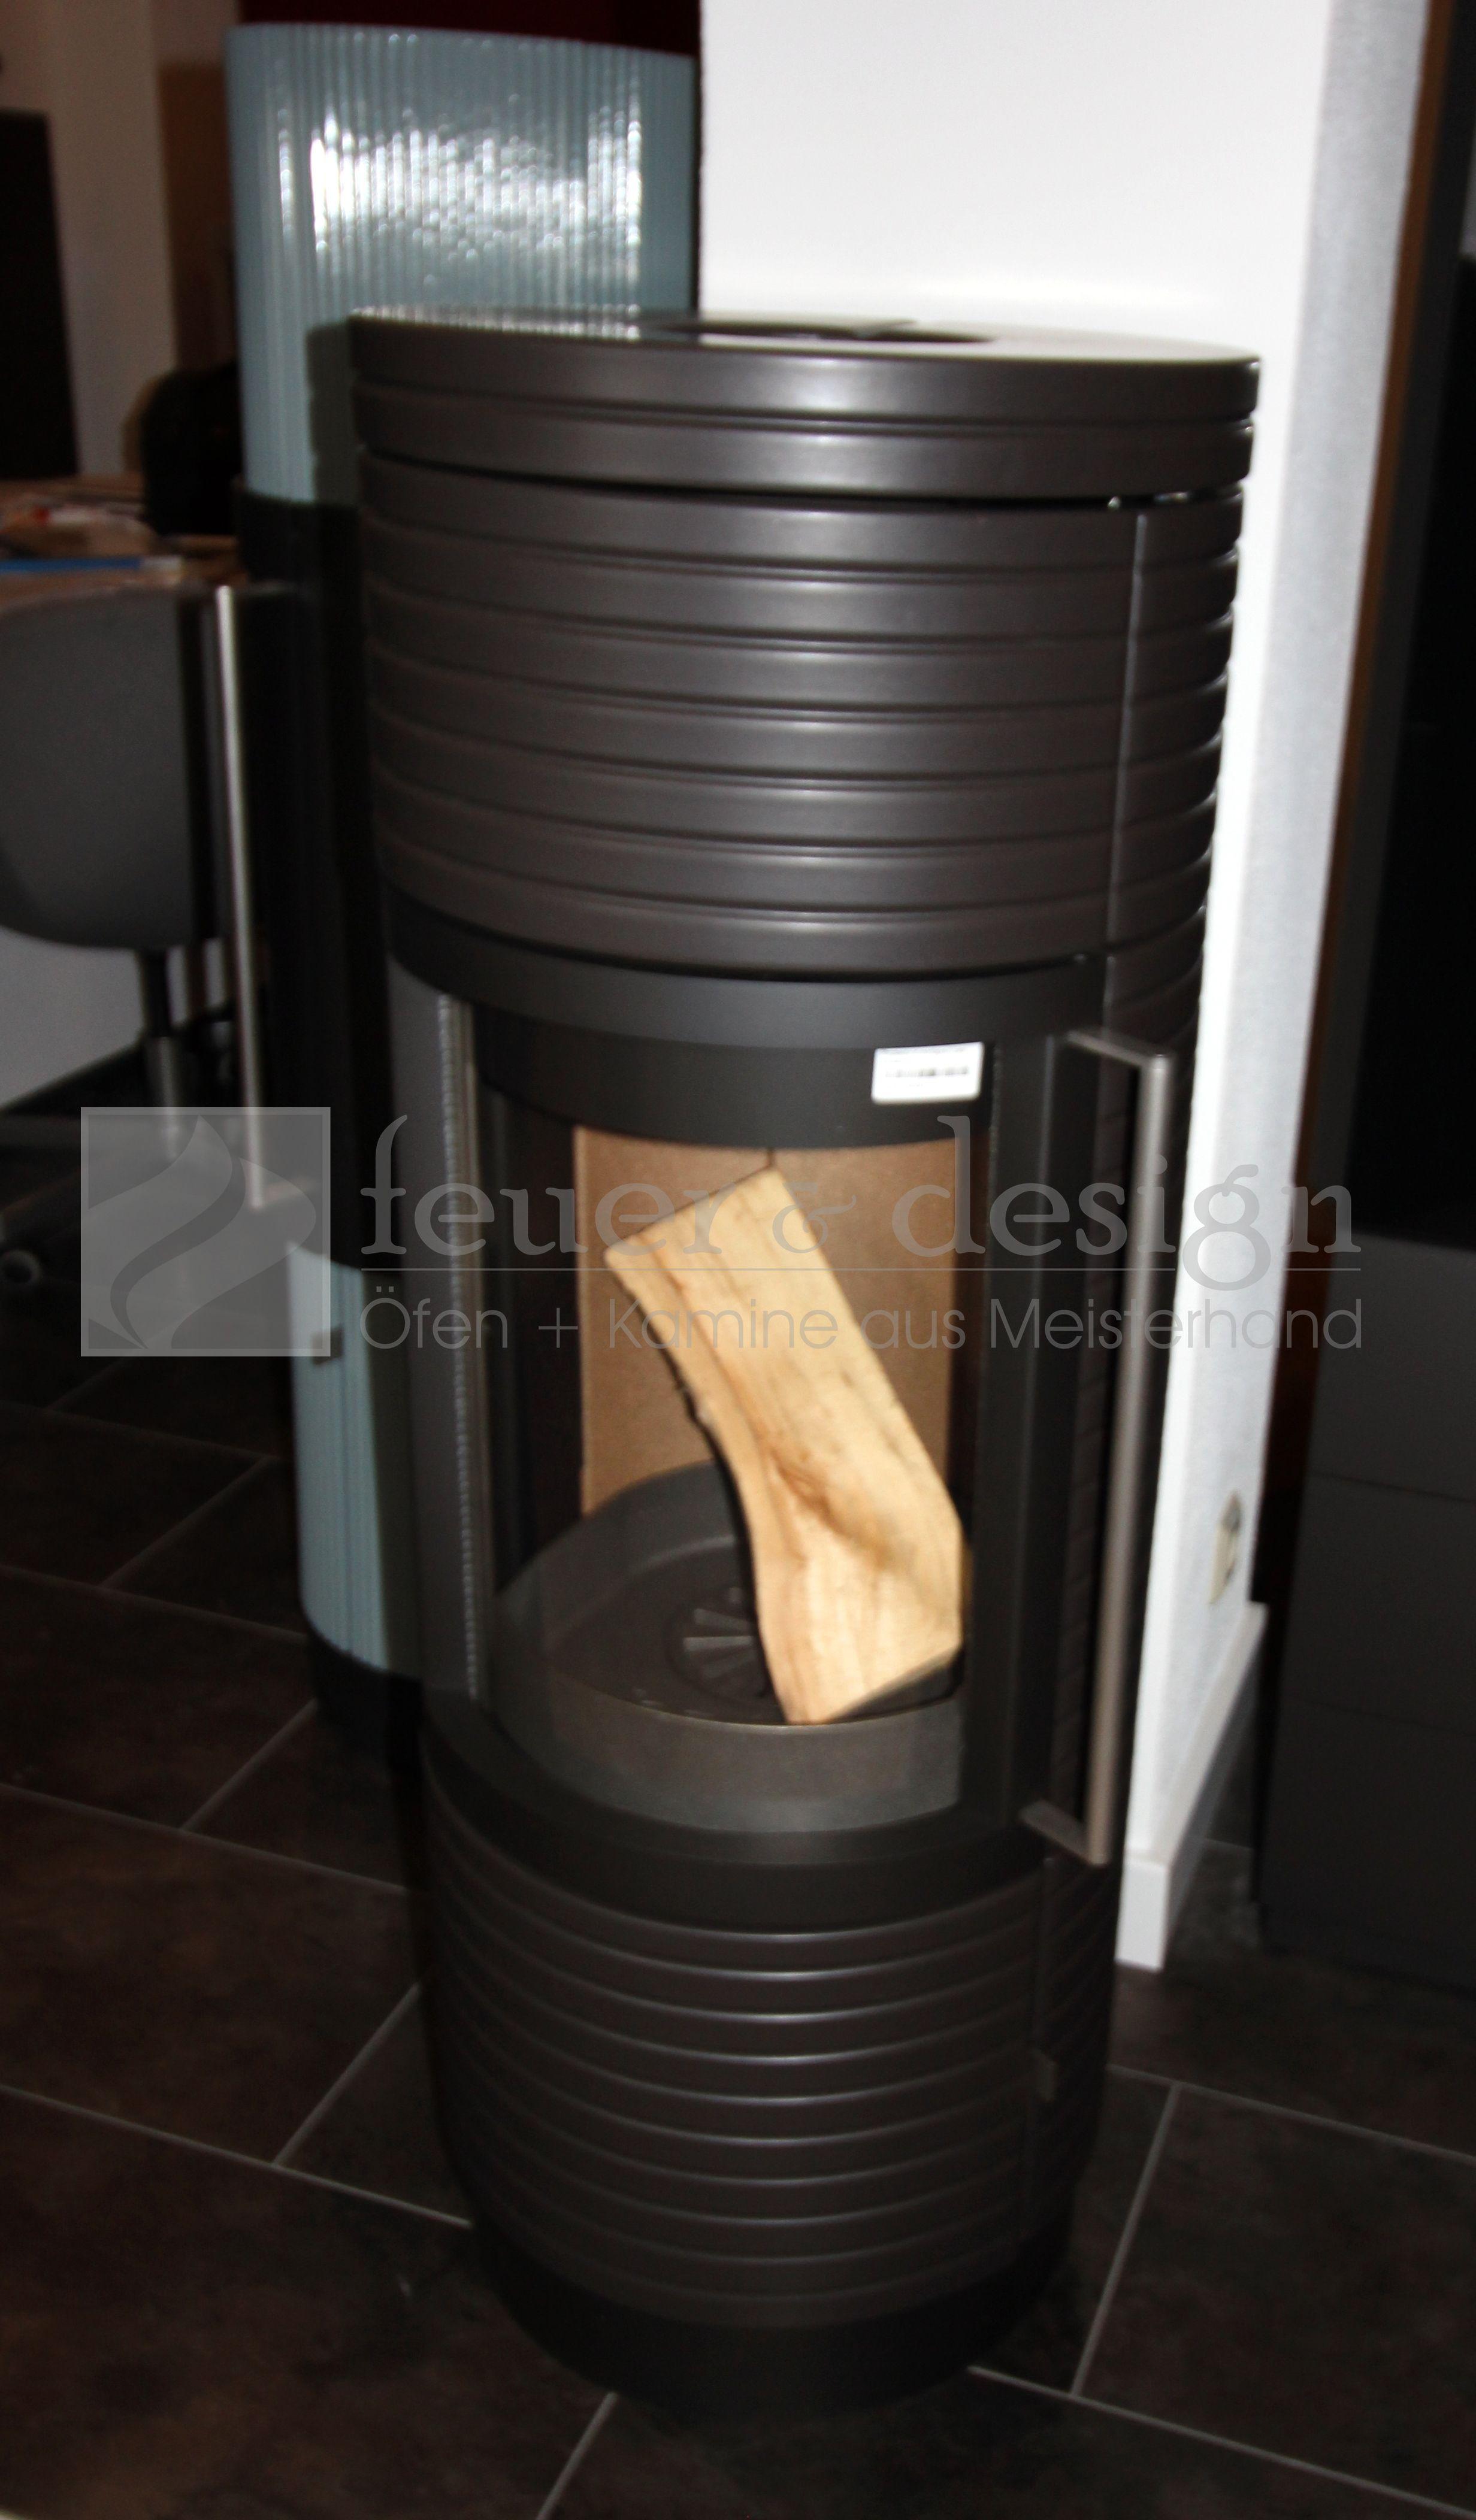 hase kaminofen lima keramik ringtextur in montagne lack schwarz ofenersatzteileshop der. Black Bedroom Furniture Sets. Home Design Ideas